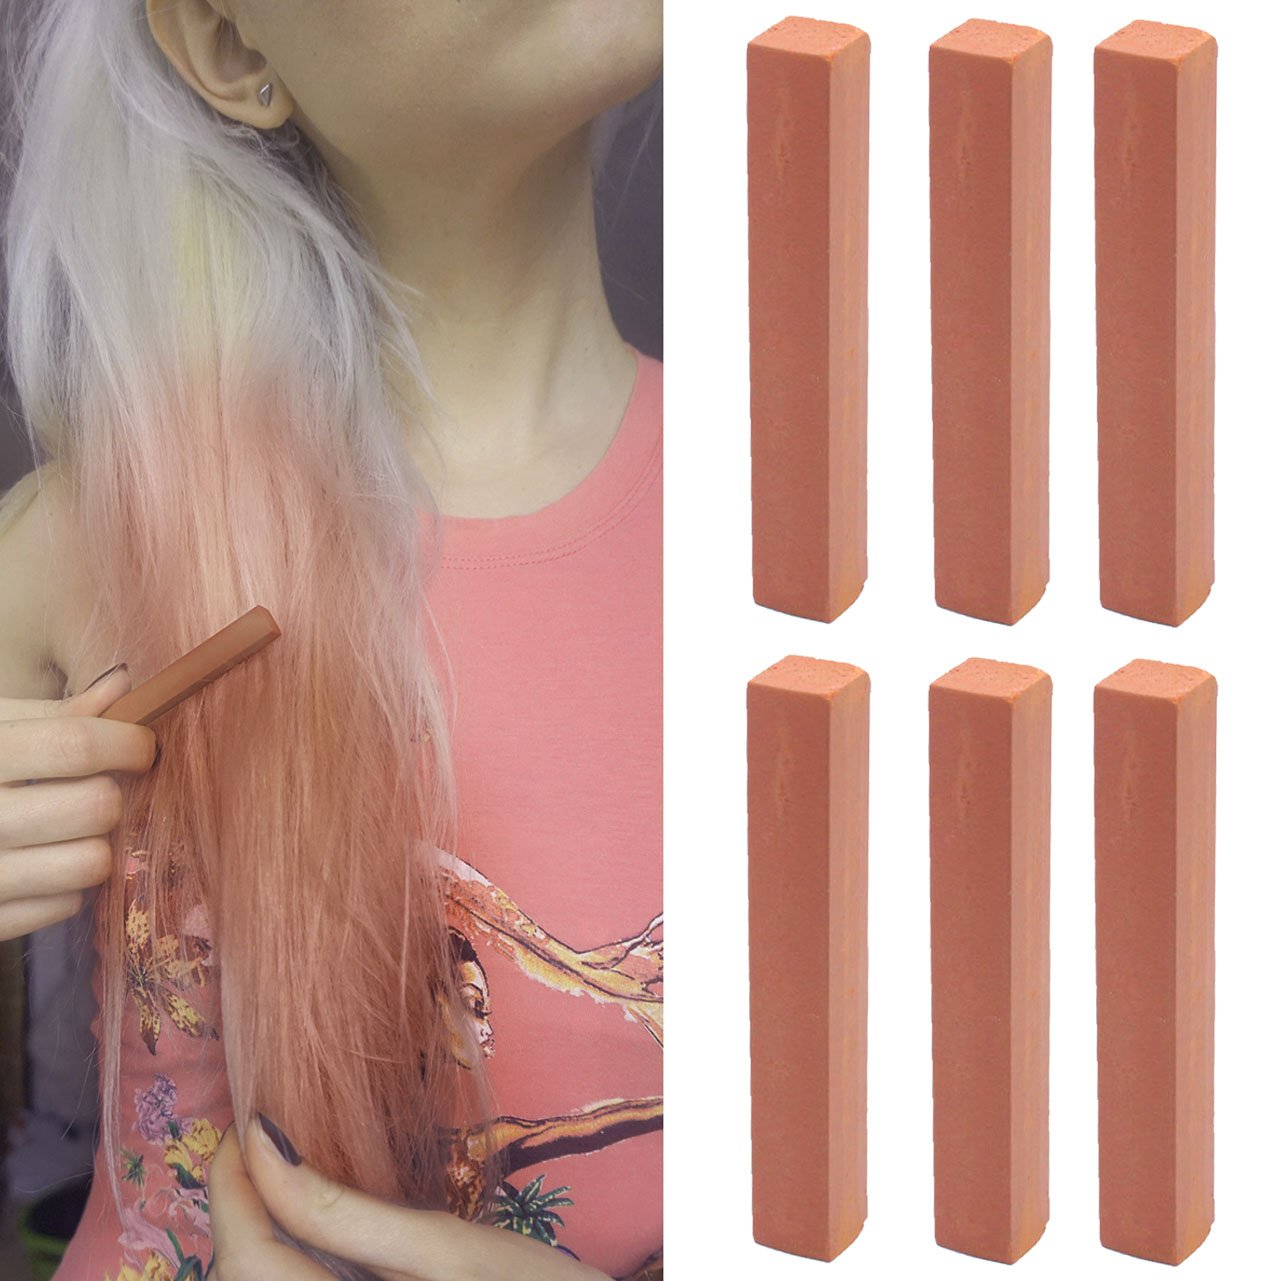 Amazon Best Temporary Brown Hair Dye Ombre Brown Hair Dye